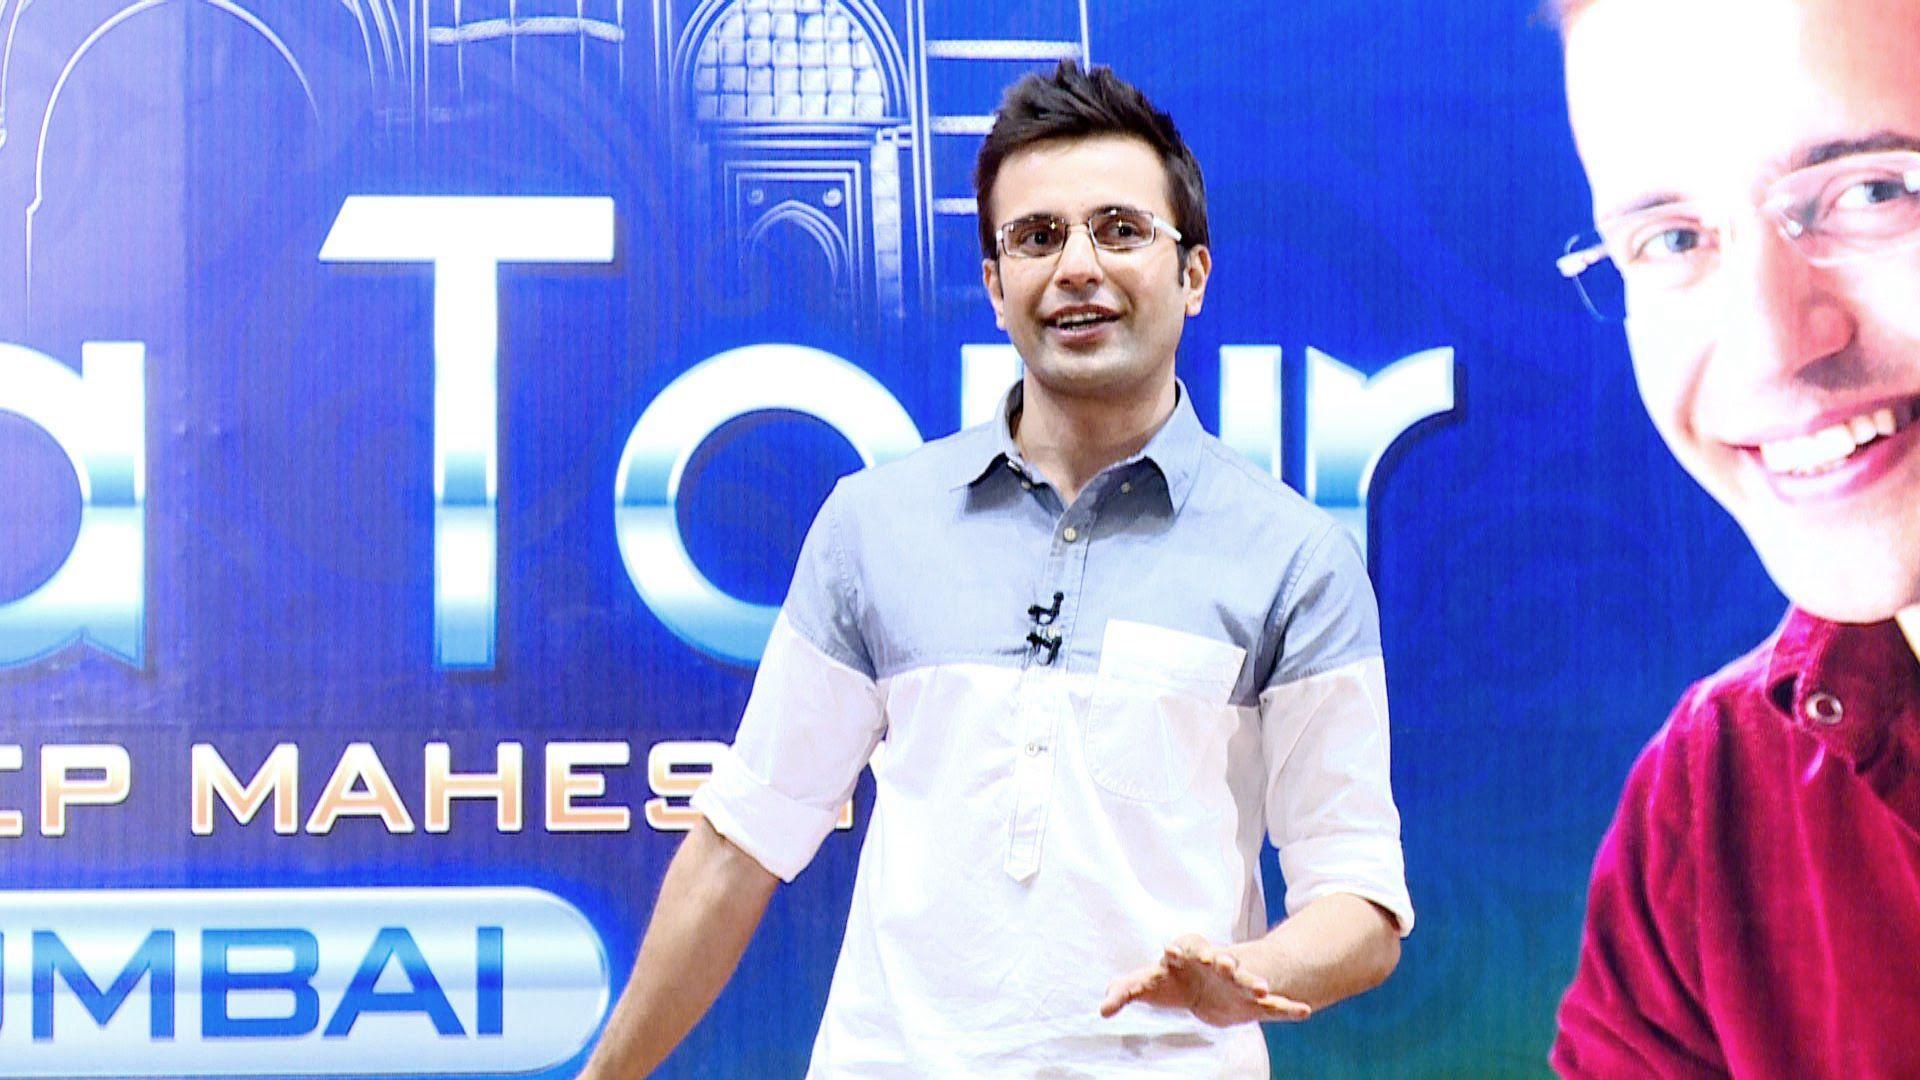 Guaranteed Success By Sandeep Maheshwari In Hindi Sandeep